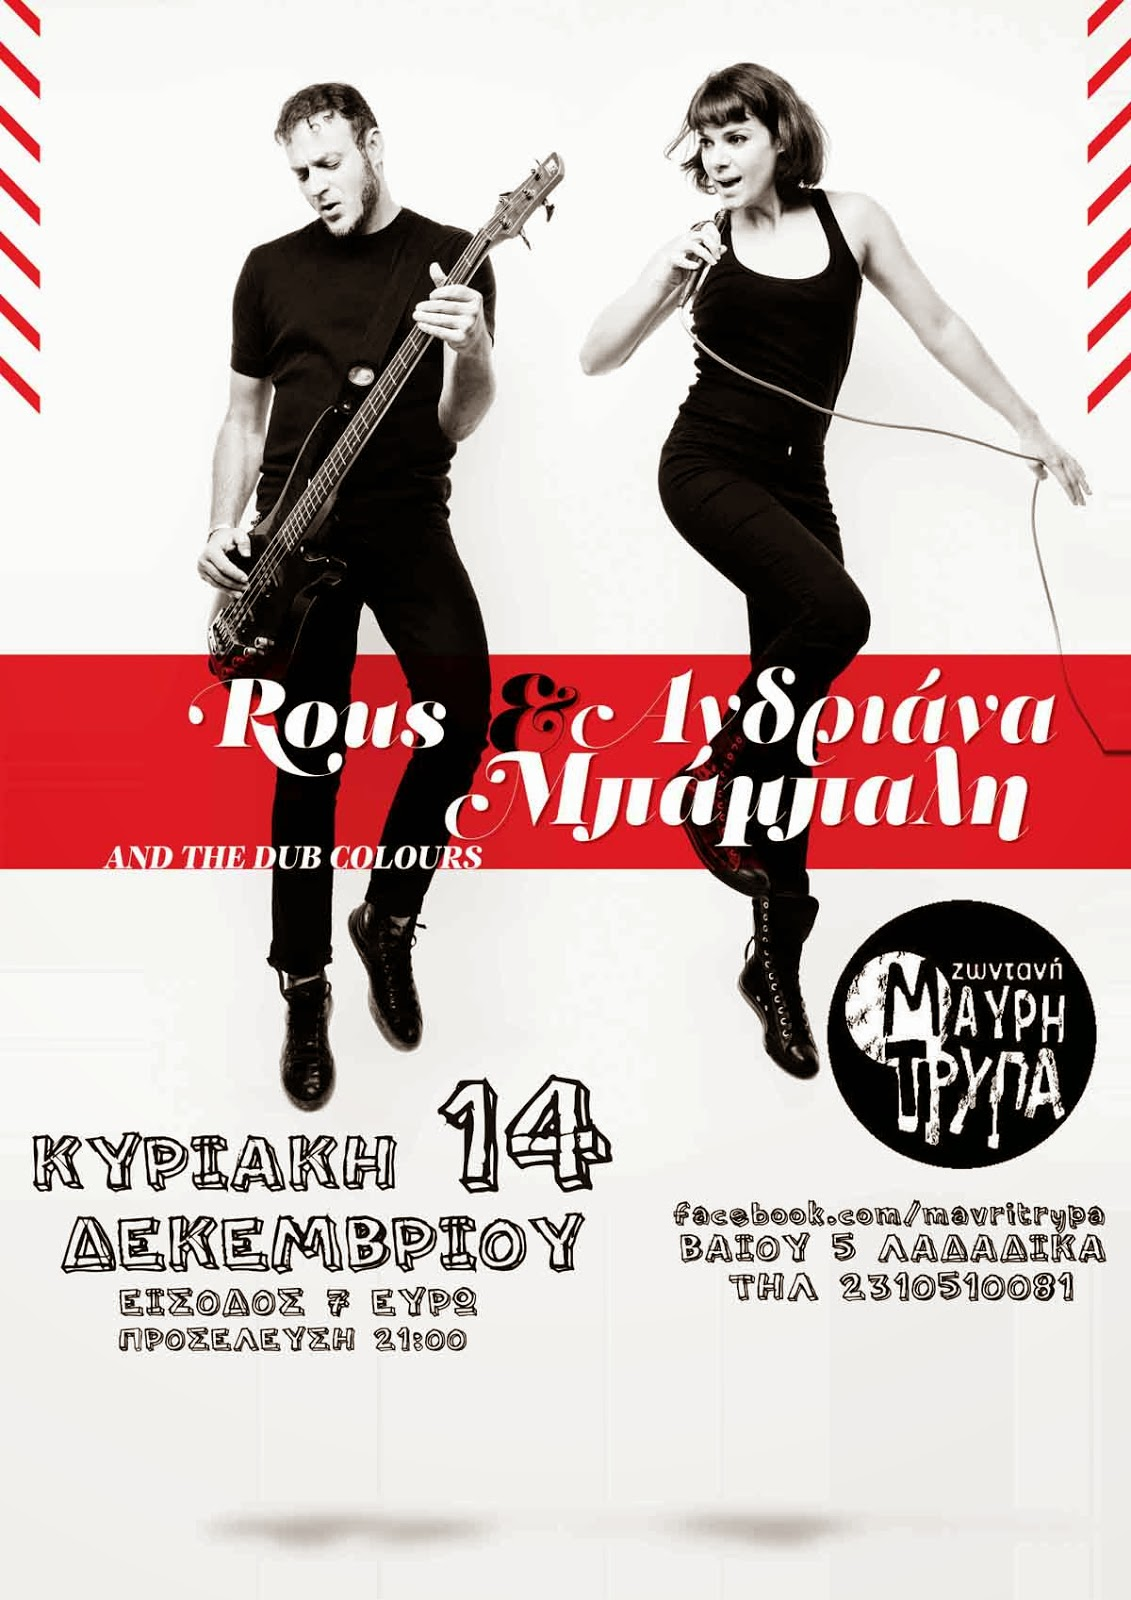 rous-andriana-bampali-zontani-mayri-trypa